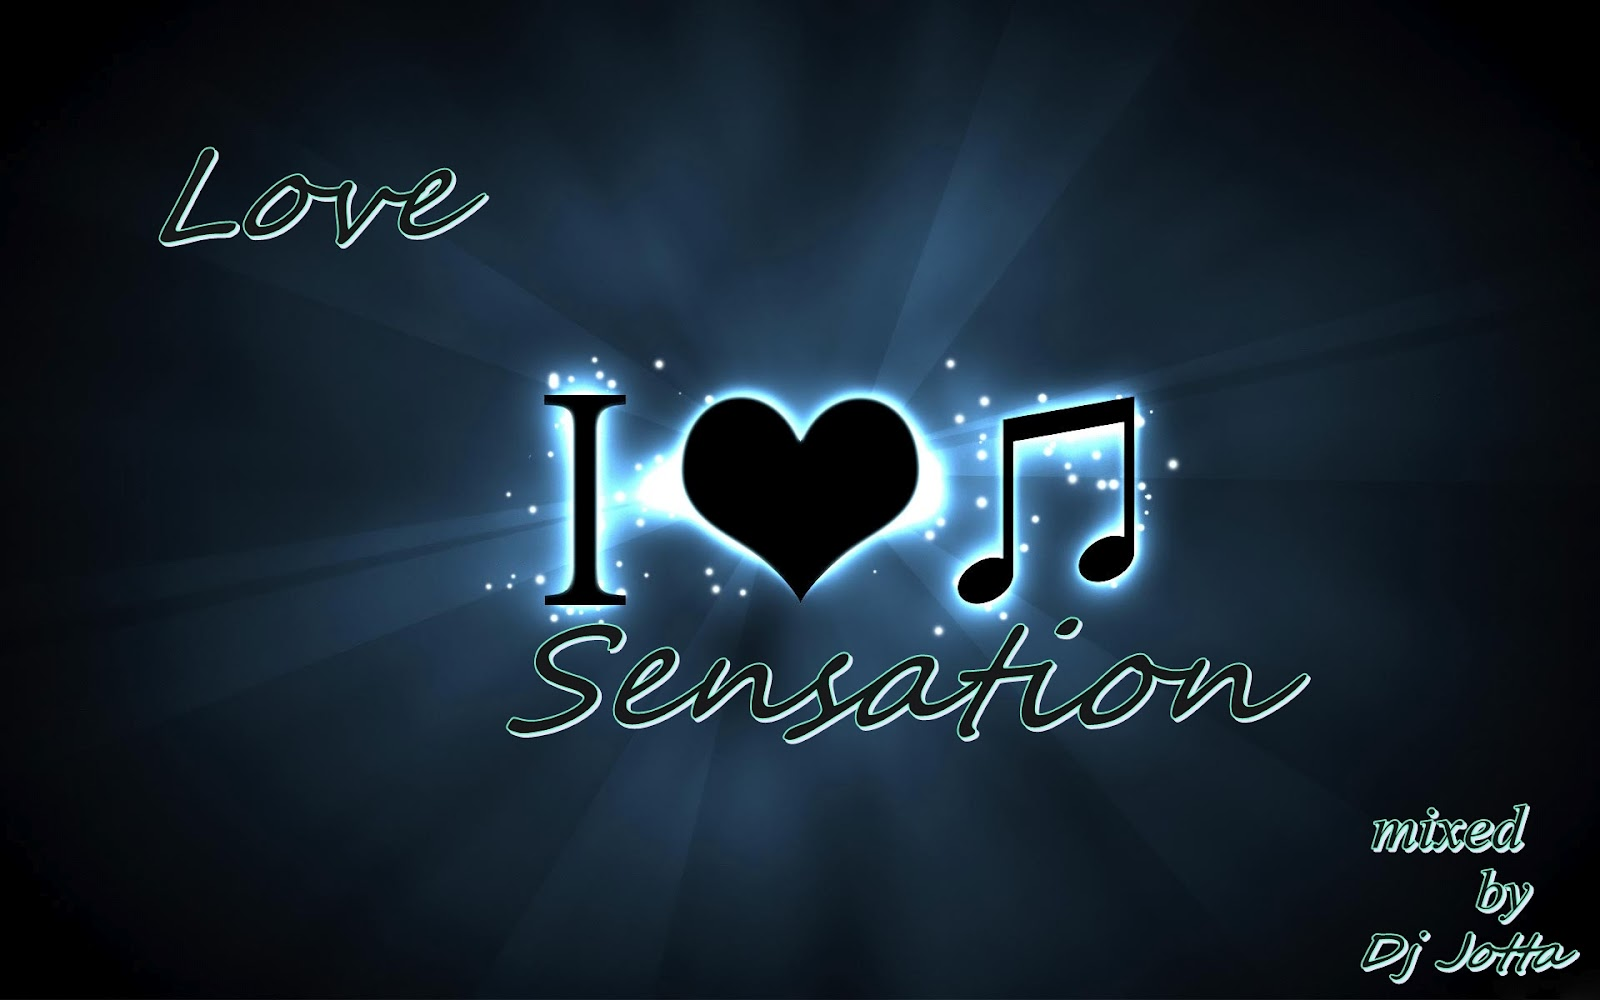 http://1.bp.blogspot.com/--kEJYd2EfHY/UEglpNPiwiI/AAAAAAAAAVw/sEnyGNBcvZc/s1600/I-Love-Music-HD-Desktop-Wallpaper.jpg